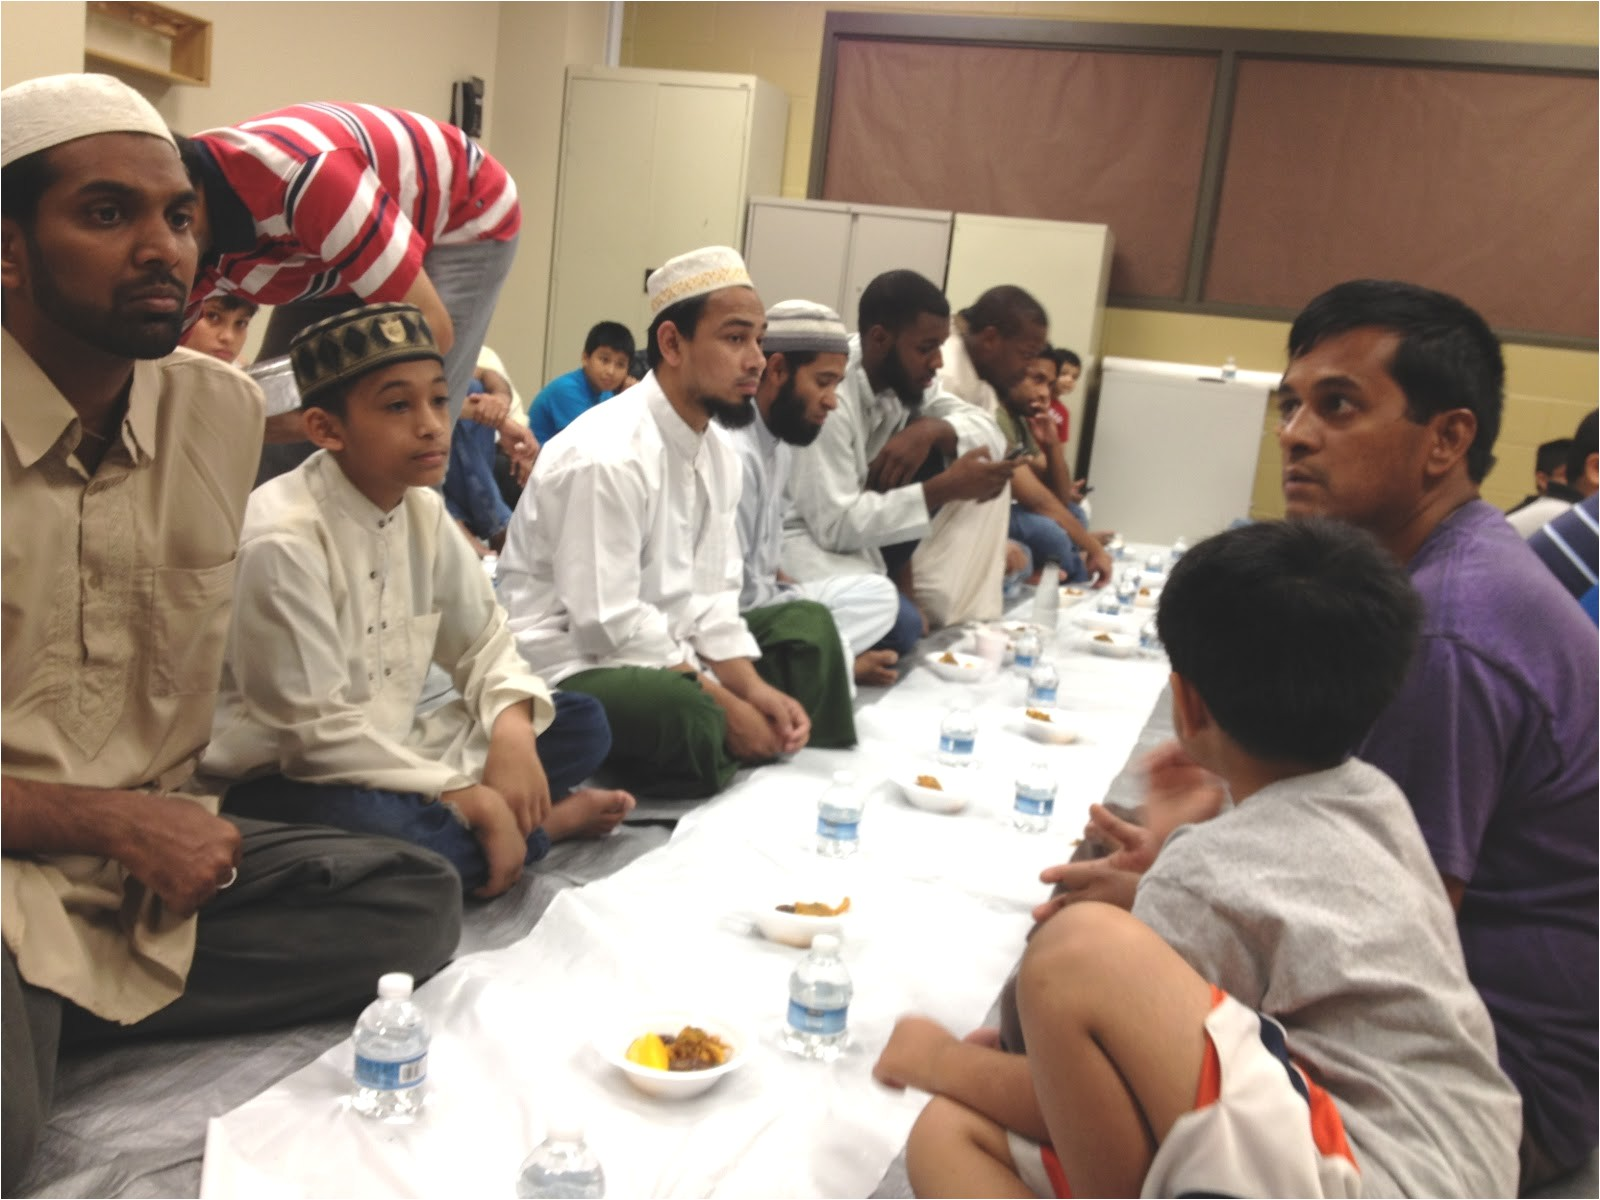 ramadan day 3 plano mosque